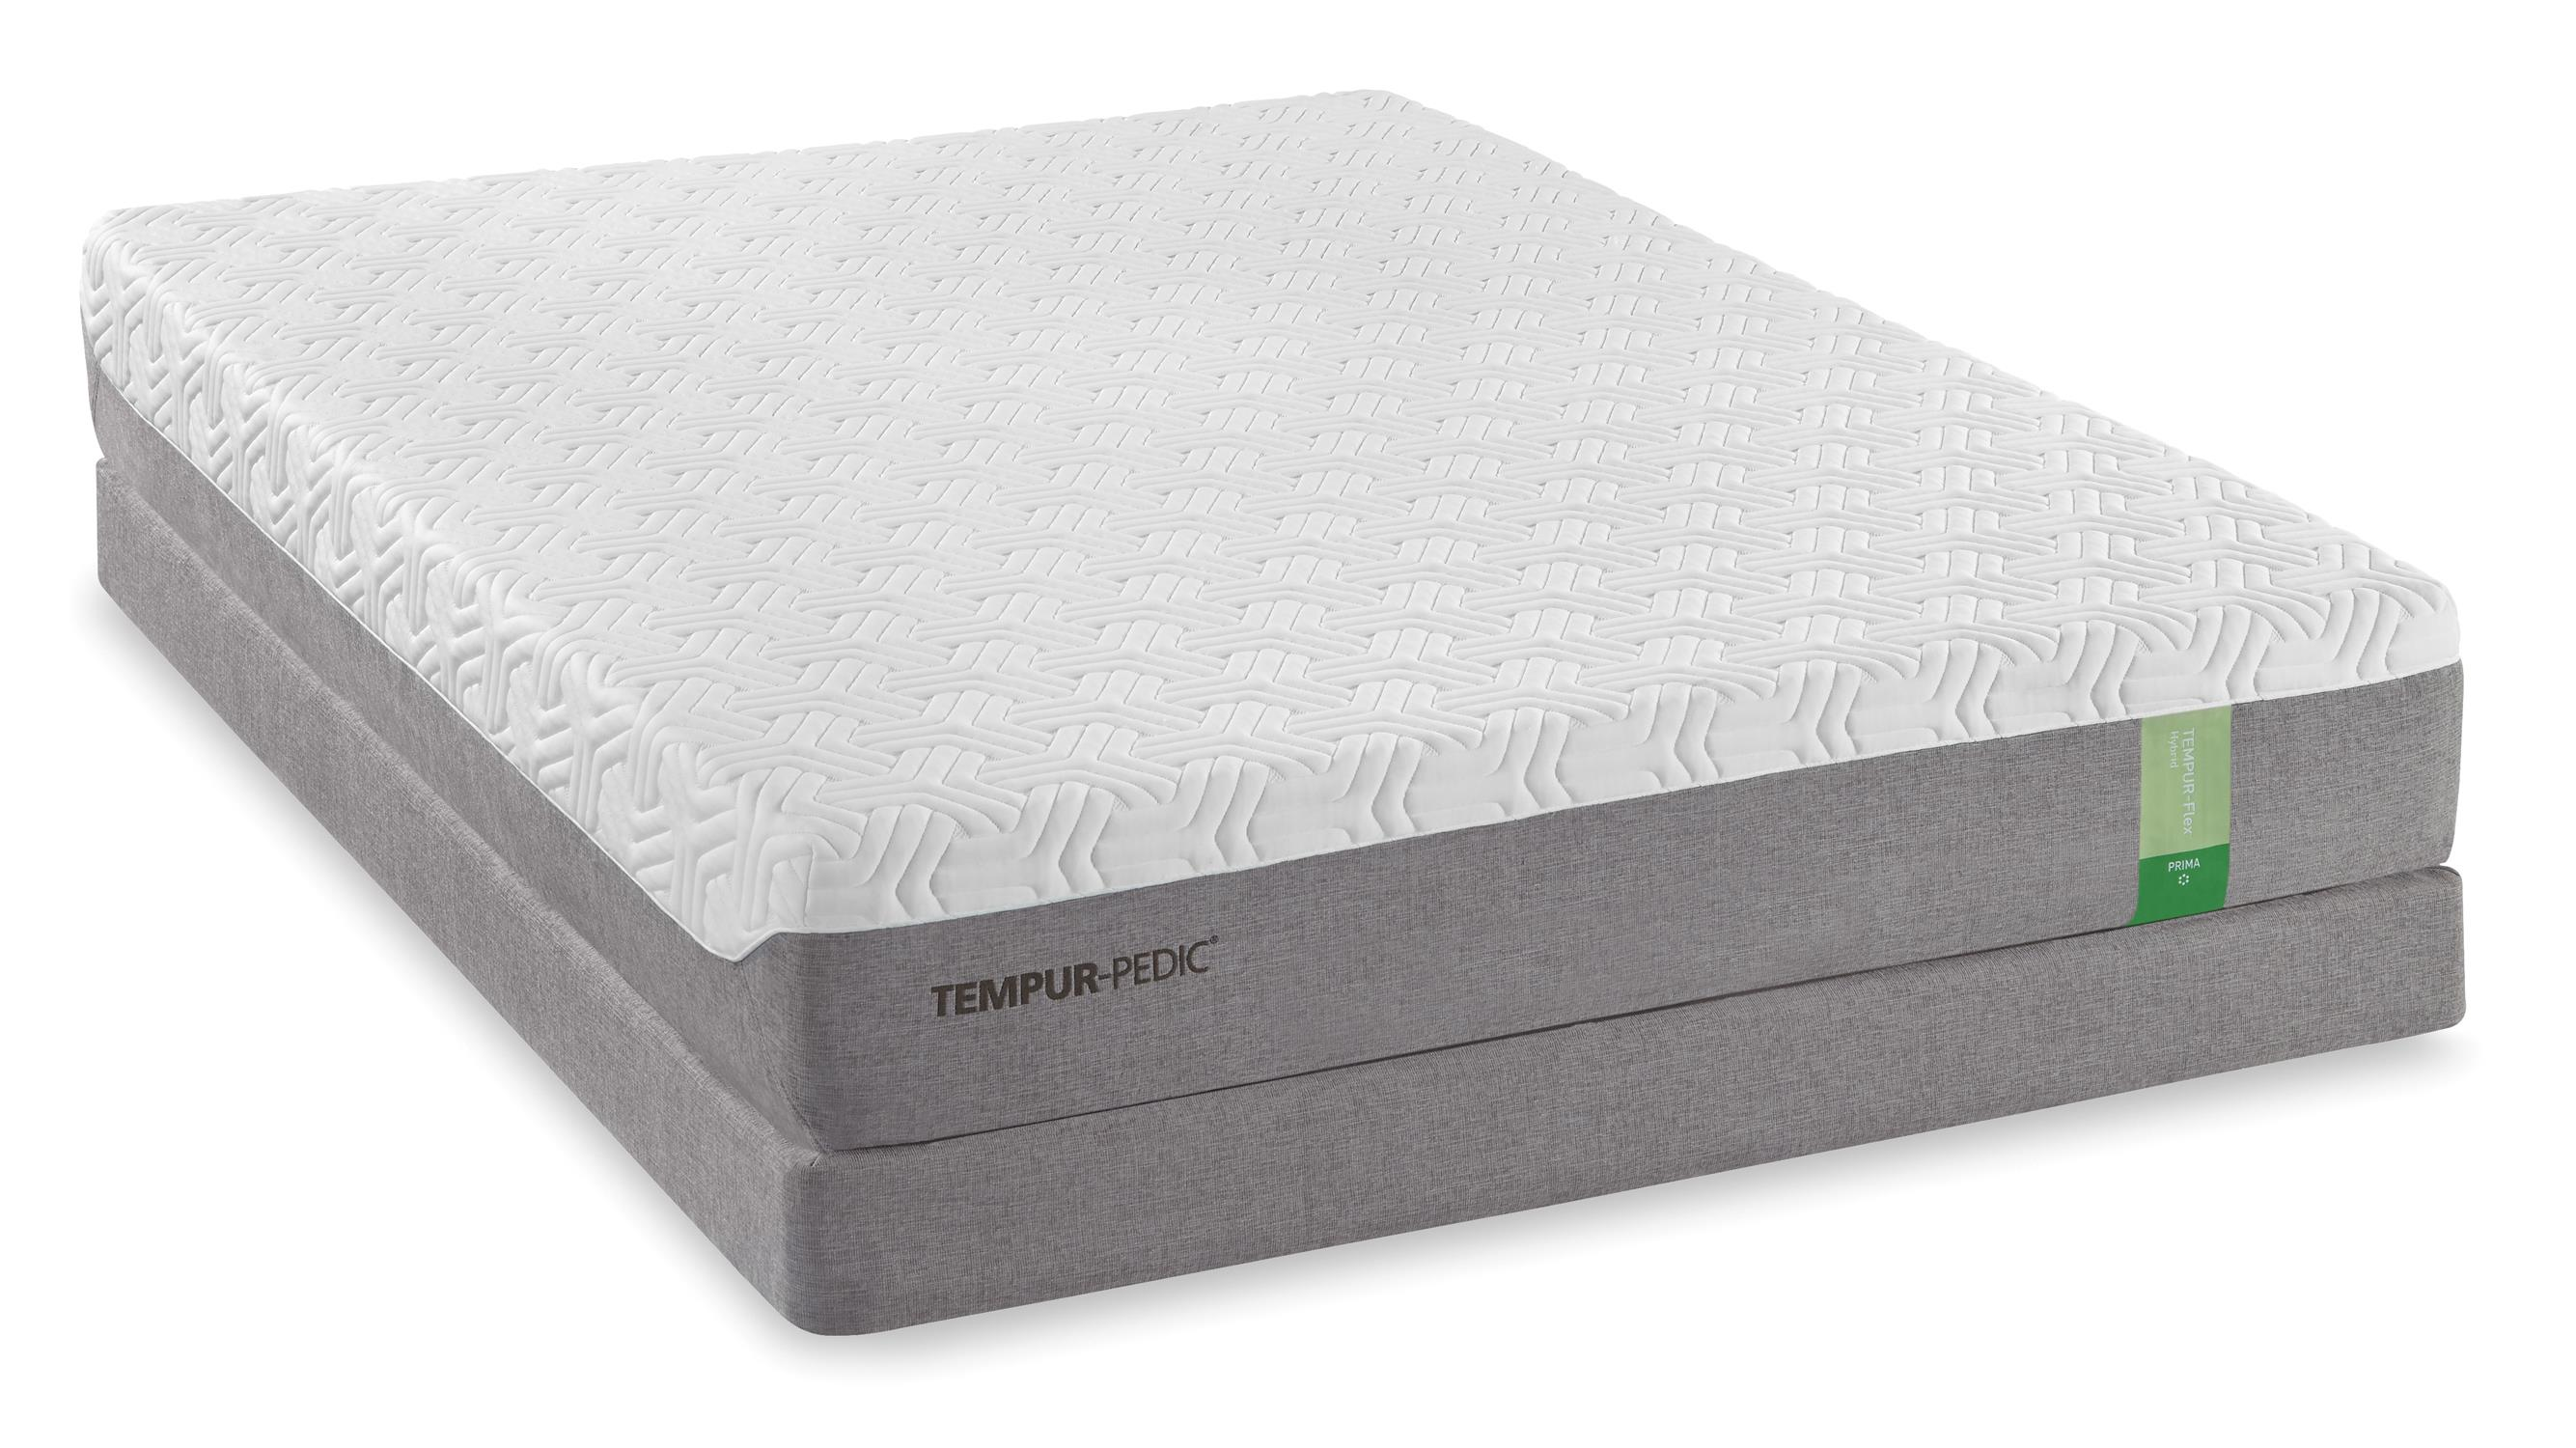 Tempur-Pedic® TEMPUR-Flex Prima Twin Medium Firm Mattress Set - Item Number: 10115210+20510110